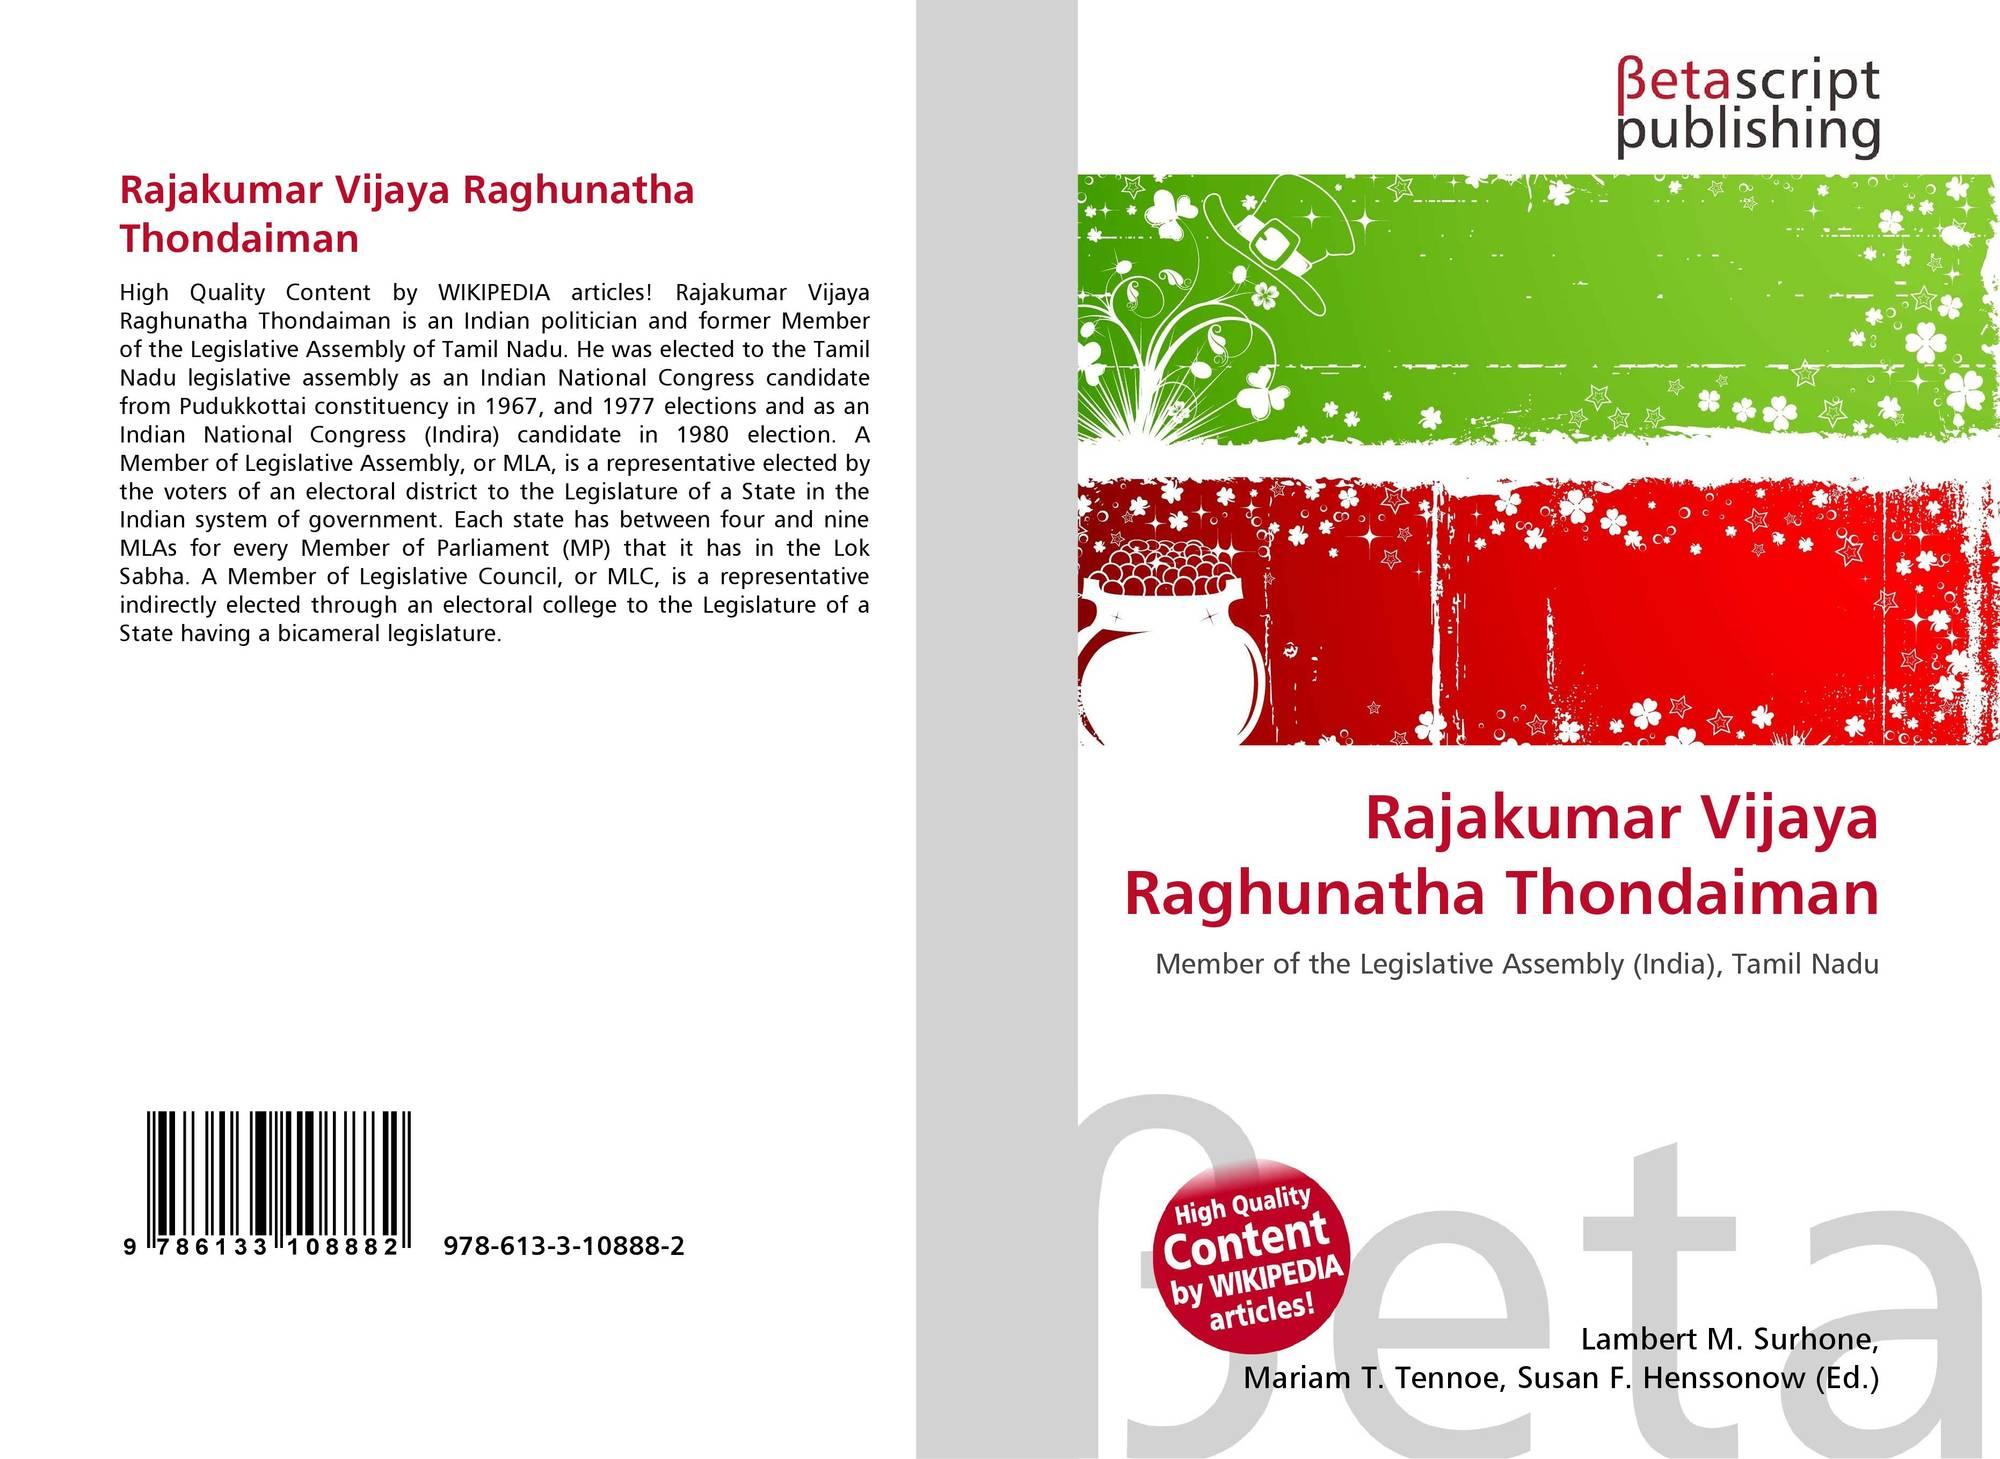 Rajakumar Vijaya Raghunatha Thondaiman, 978-613-3-10888-2